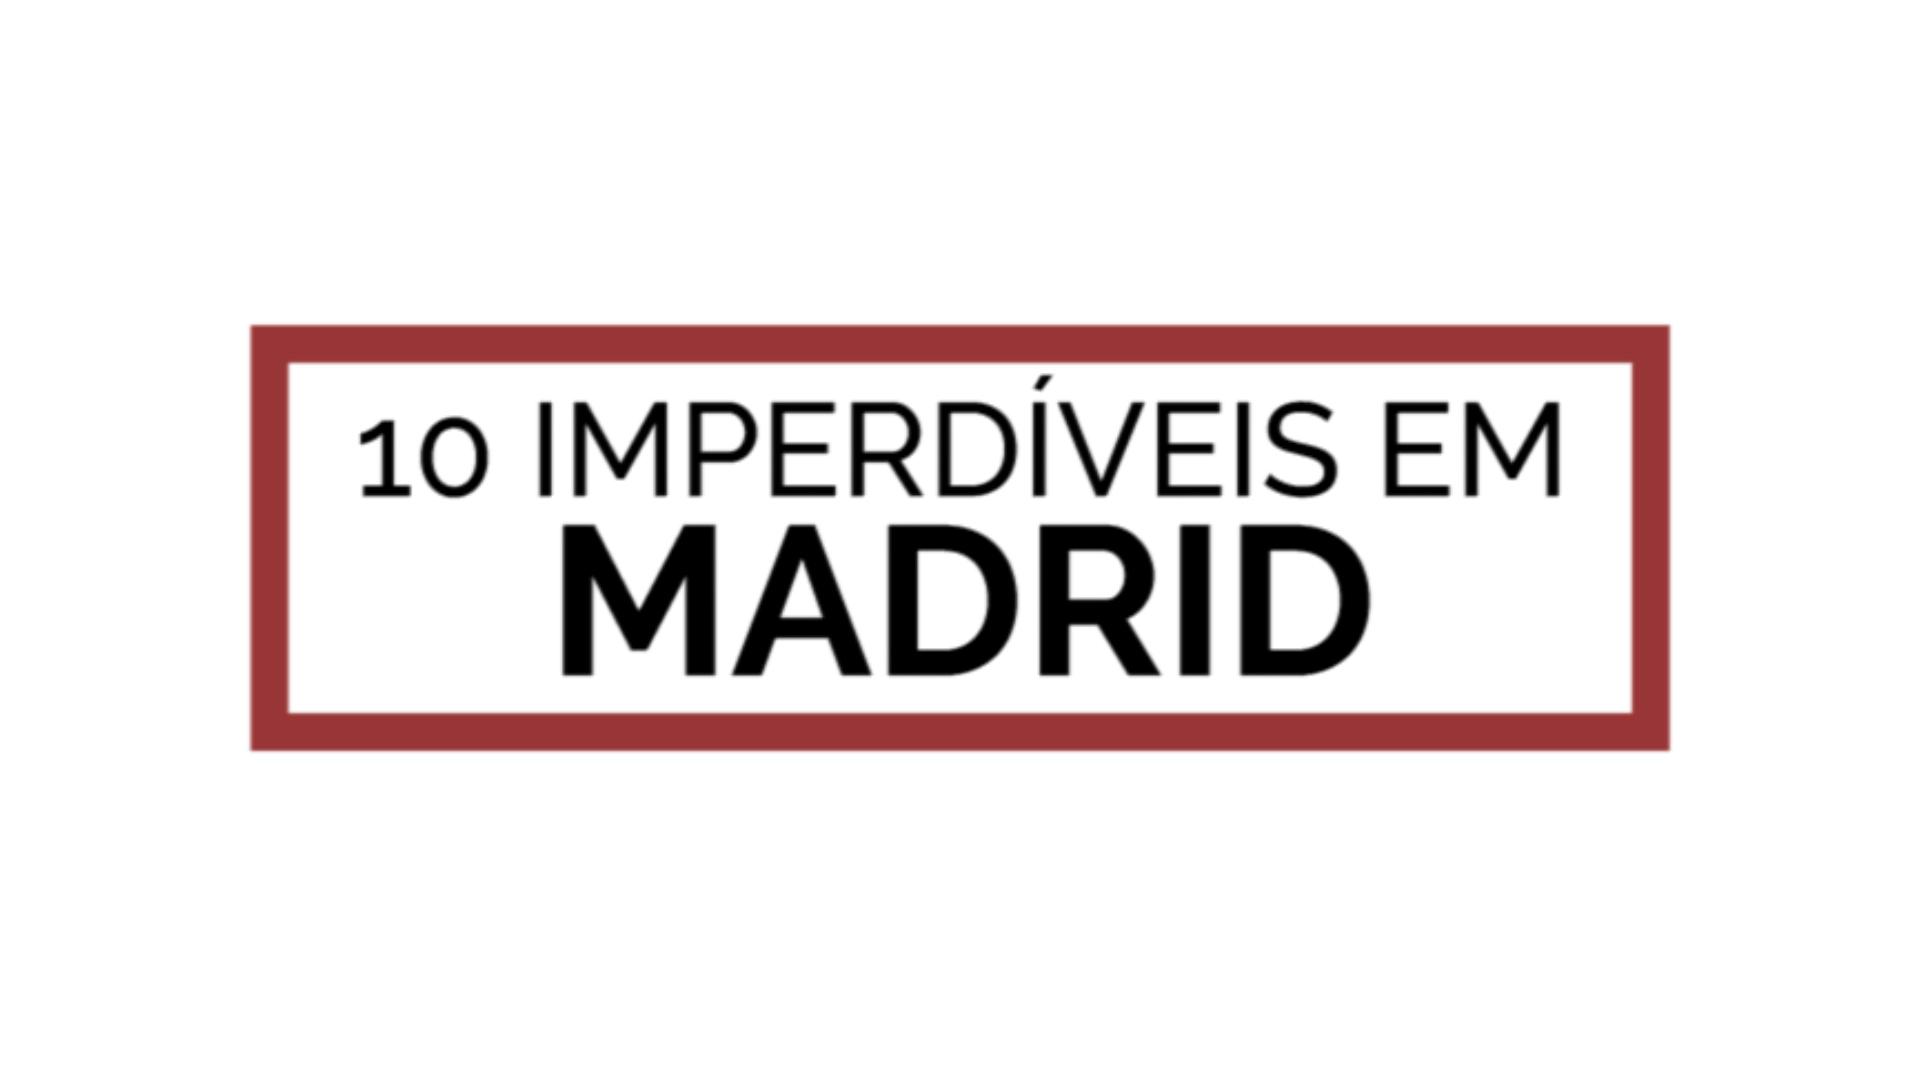 still 10 imperdíveis em madrid